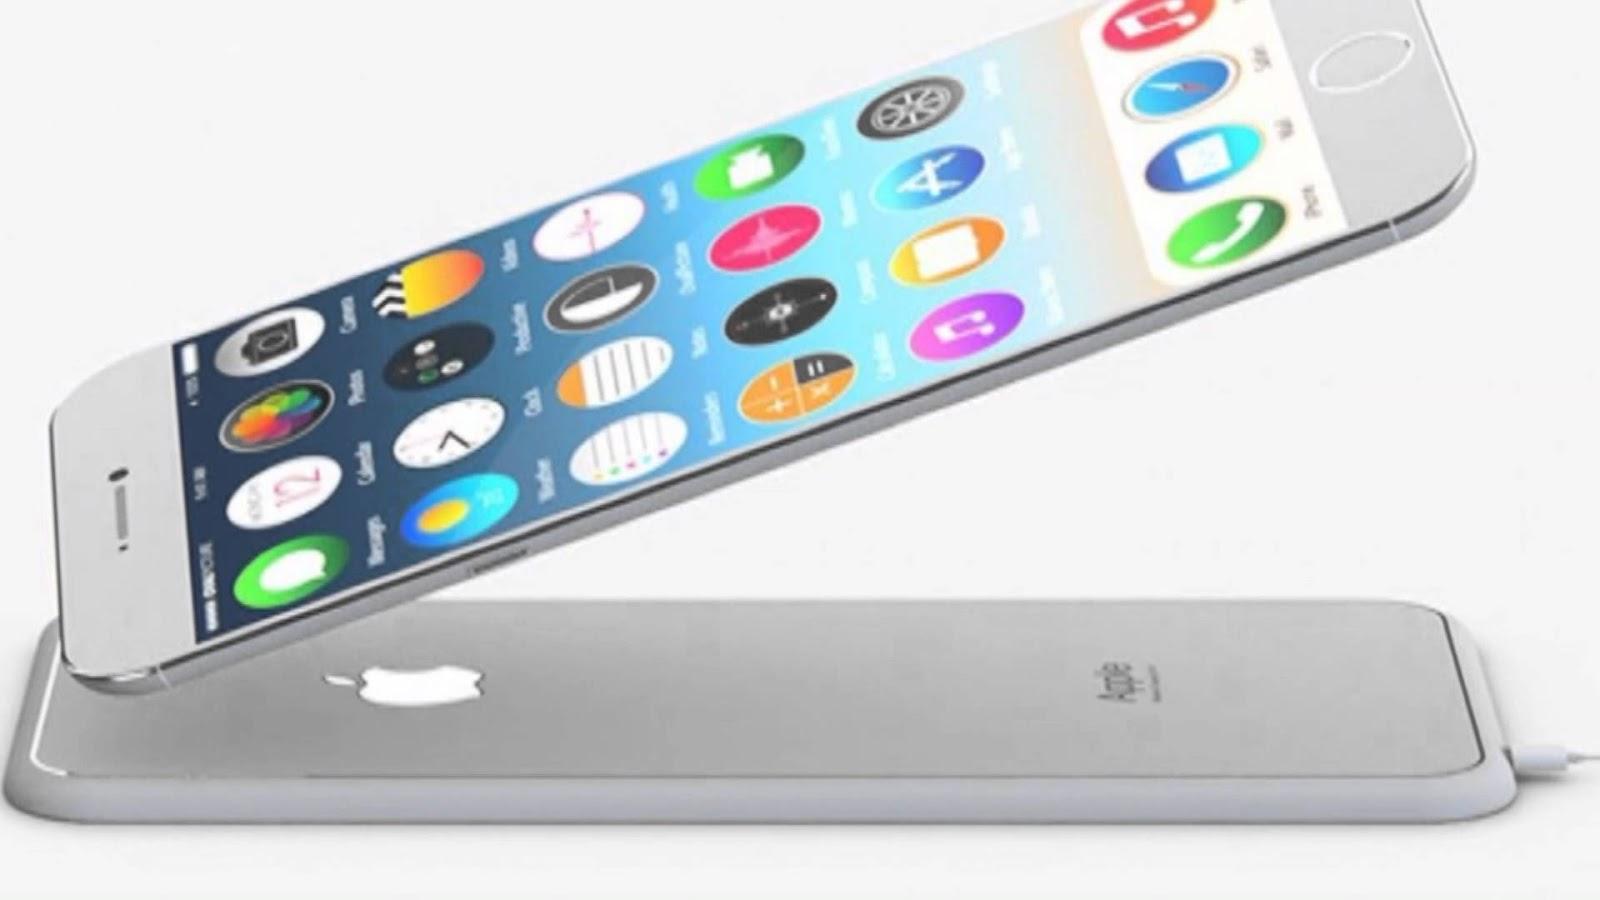 Bemutatjuk Az Igazi Prototipust Ilyen Lehet Az Iphone 7 Es 7 Plus